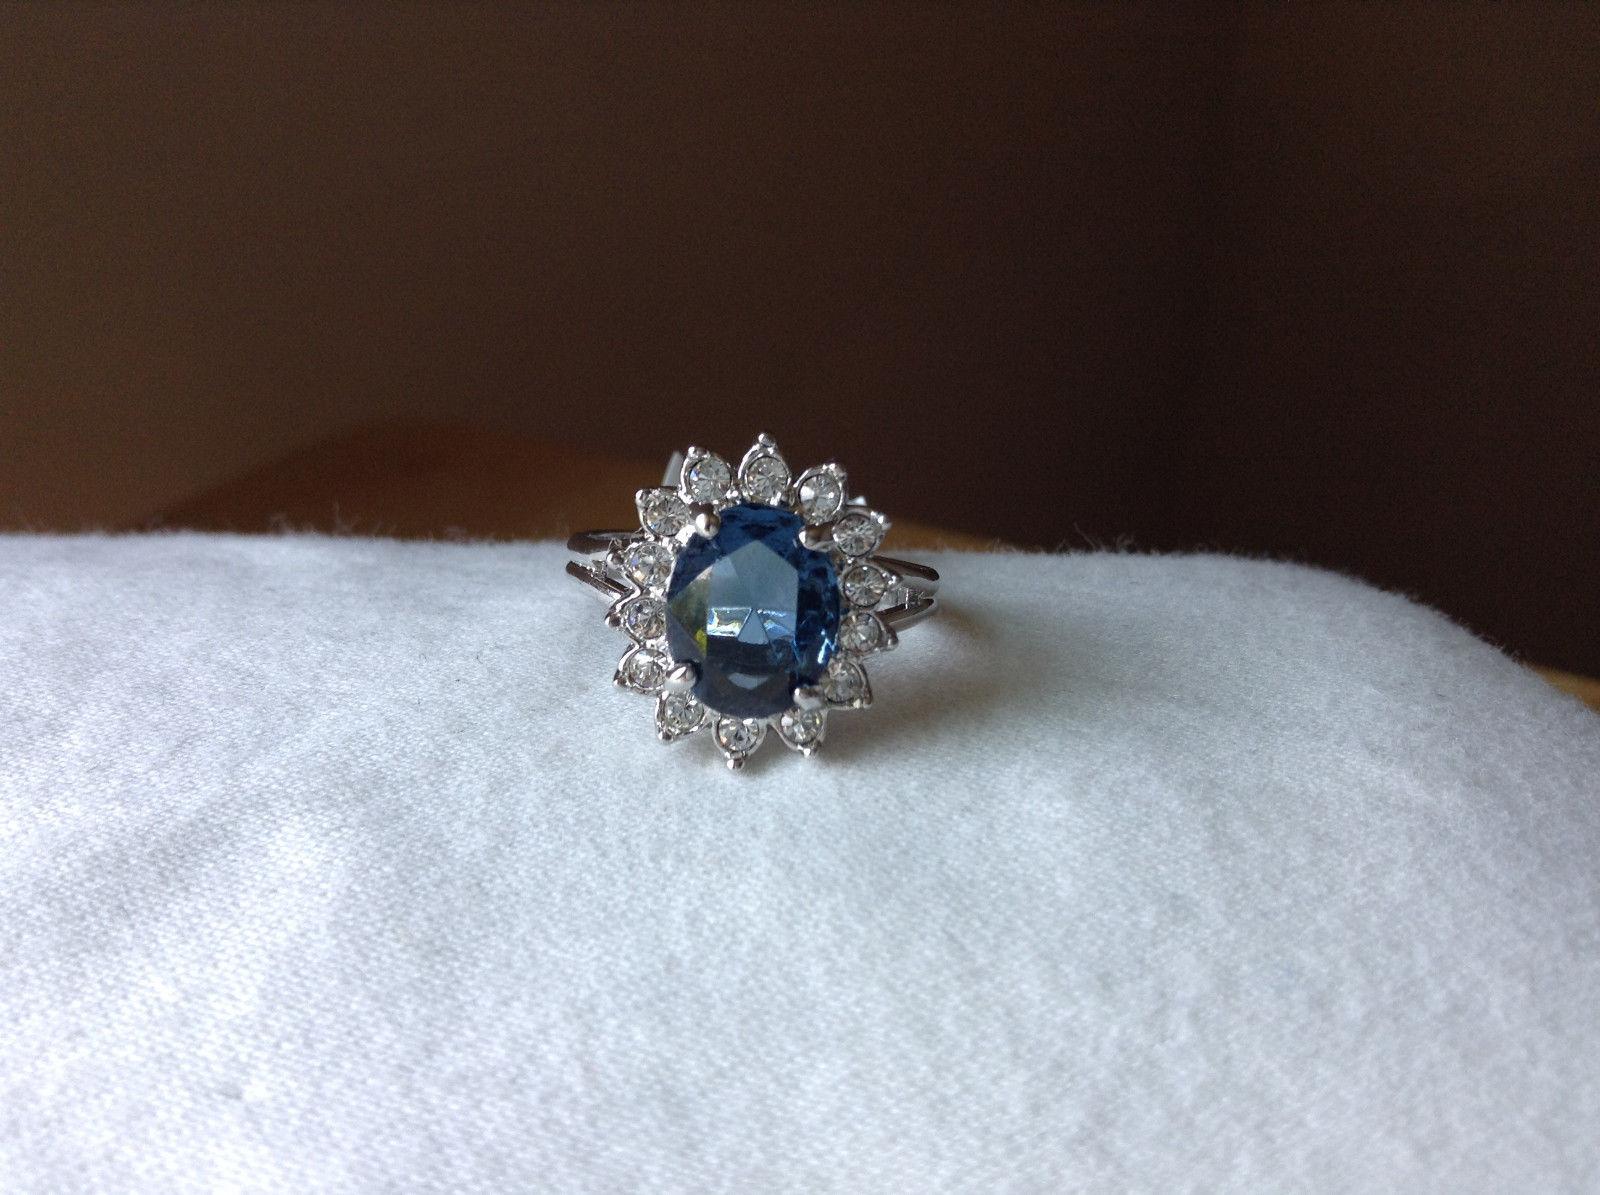 Blue CZ Stone Sunburst White Stone Border Stainless Steel Ring Size 7 and 7.75